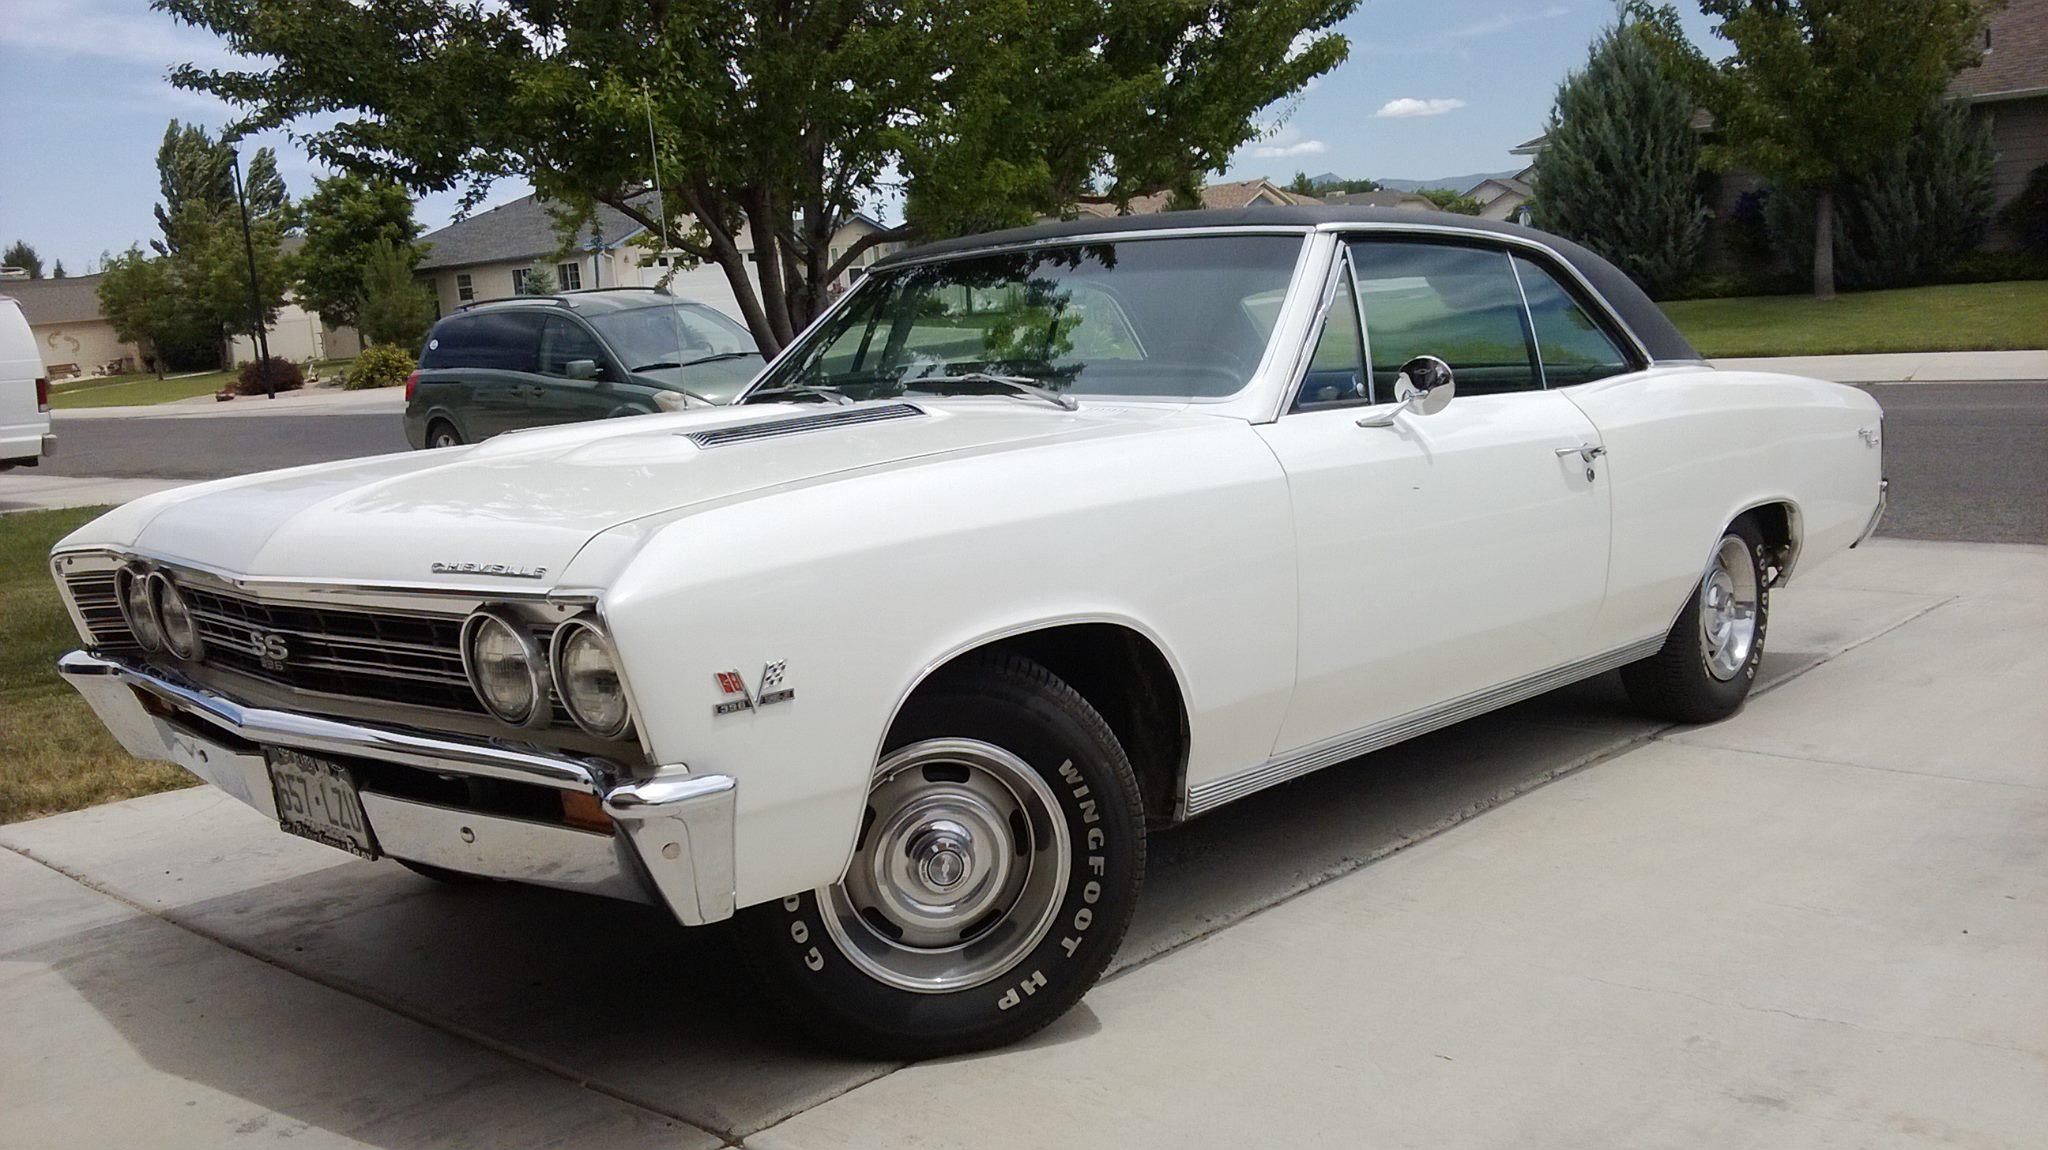 Chevrolet Chevelle I 1963 - 1967 Coupe-Hardtop #1